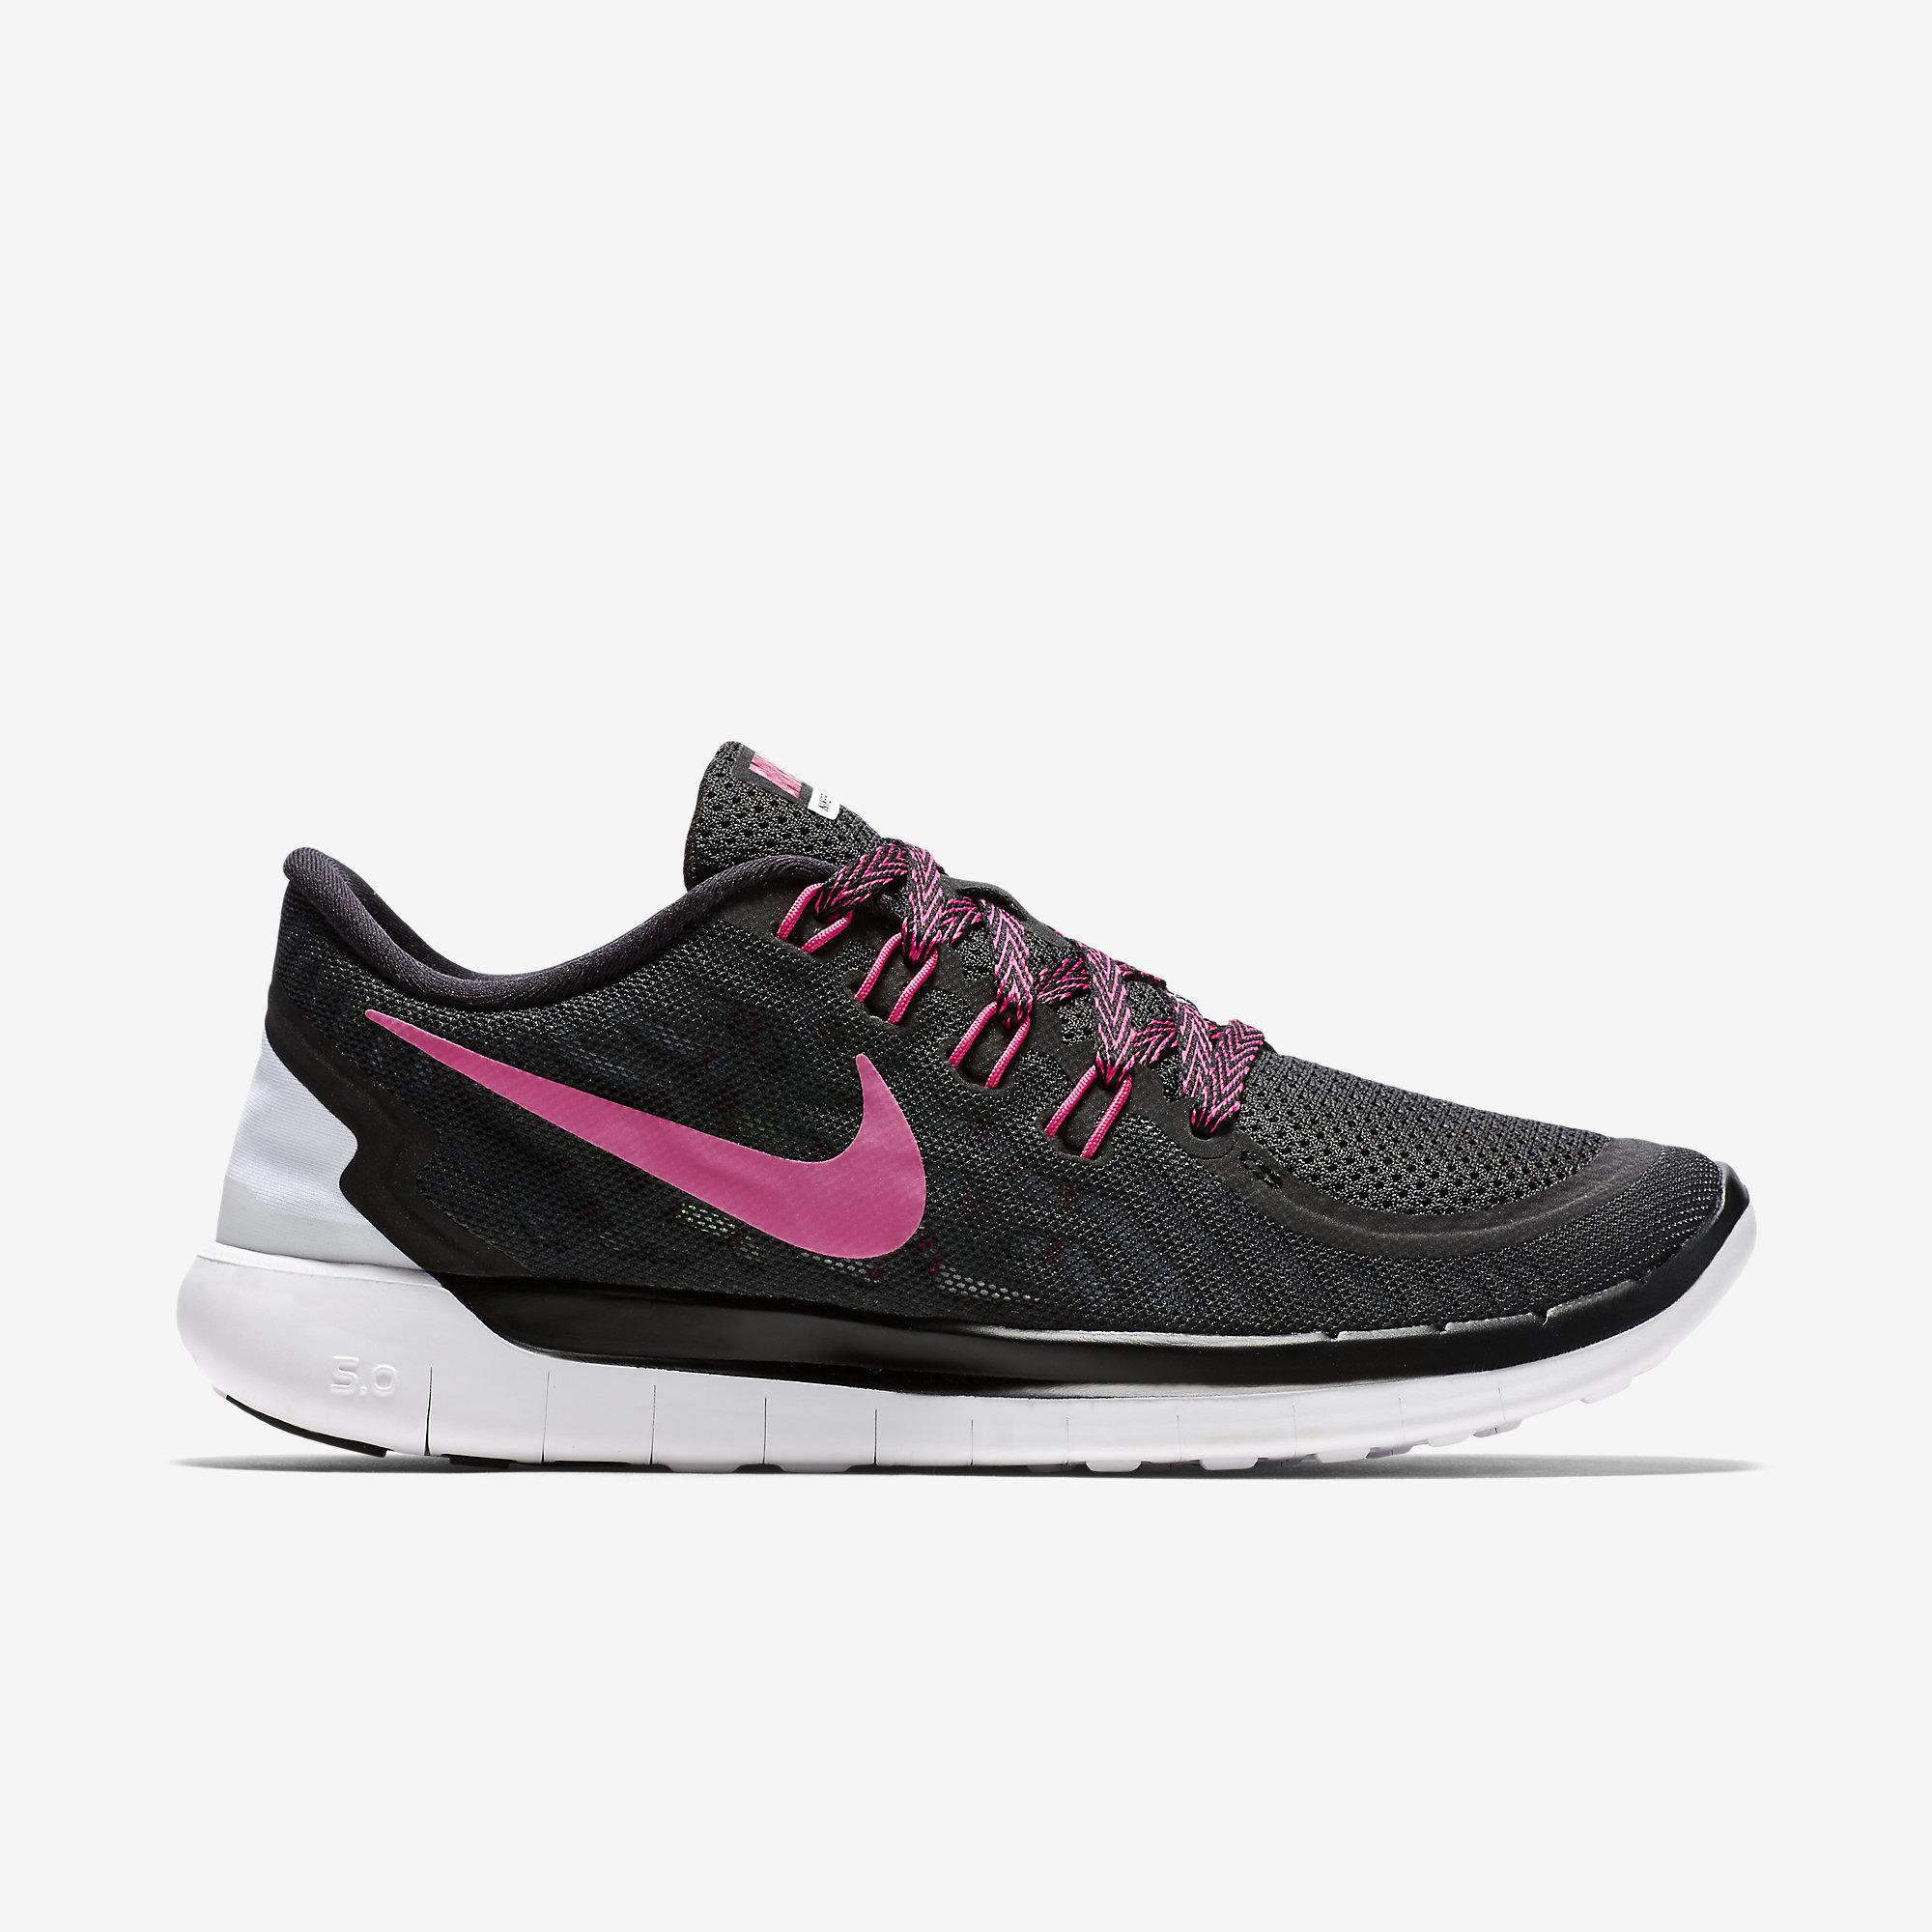 new concept 9b170 ab1b8 Nike Womens Free 5.0 Running Shoes - BlackPink - Tennisnuts.